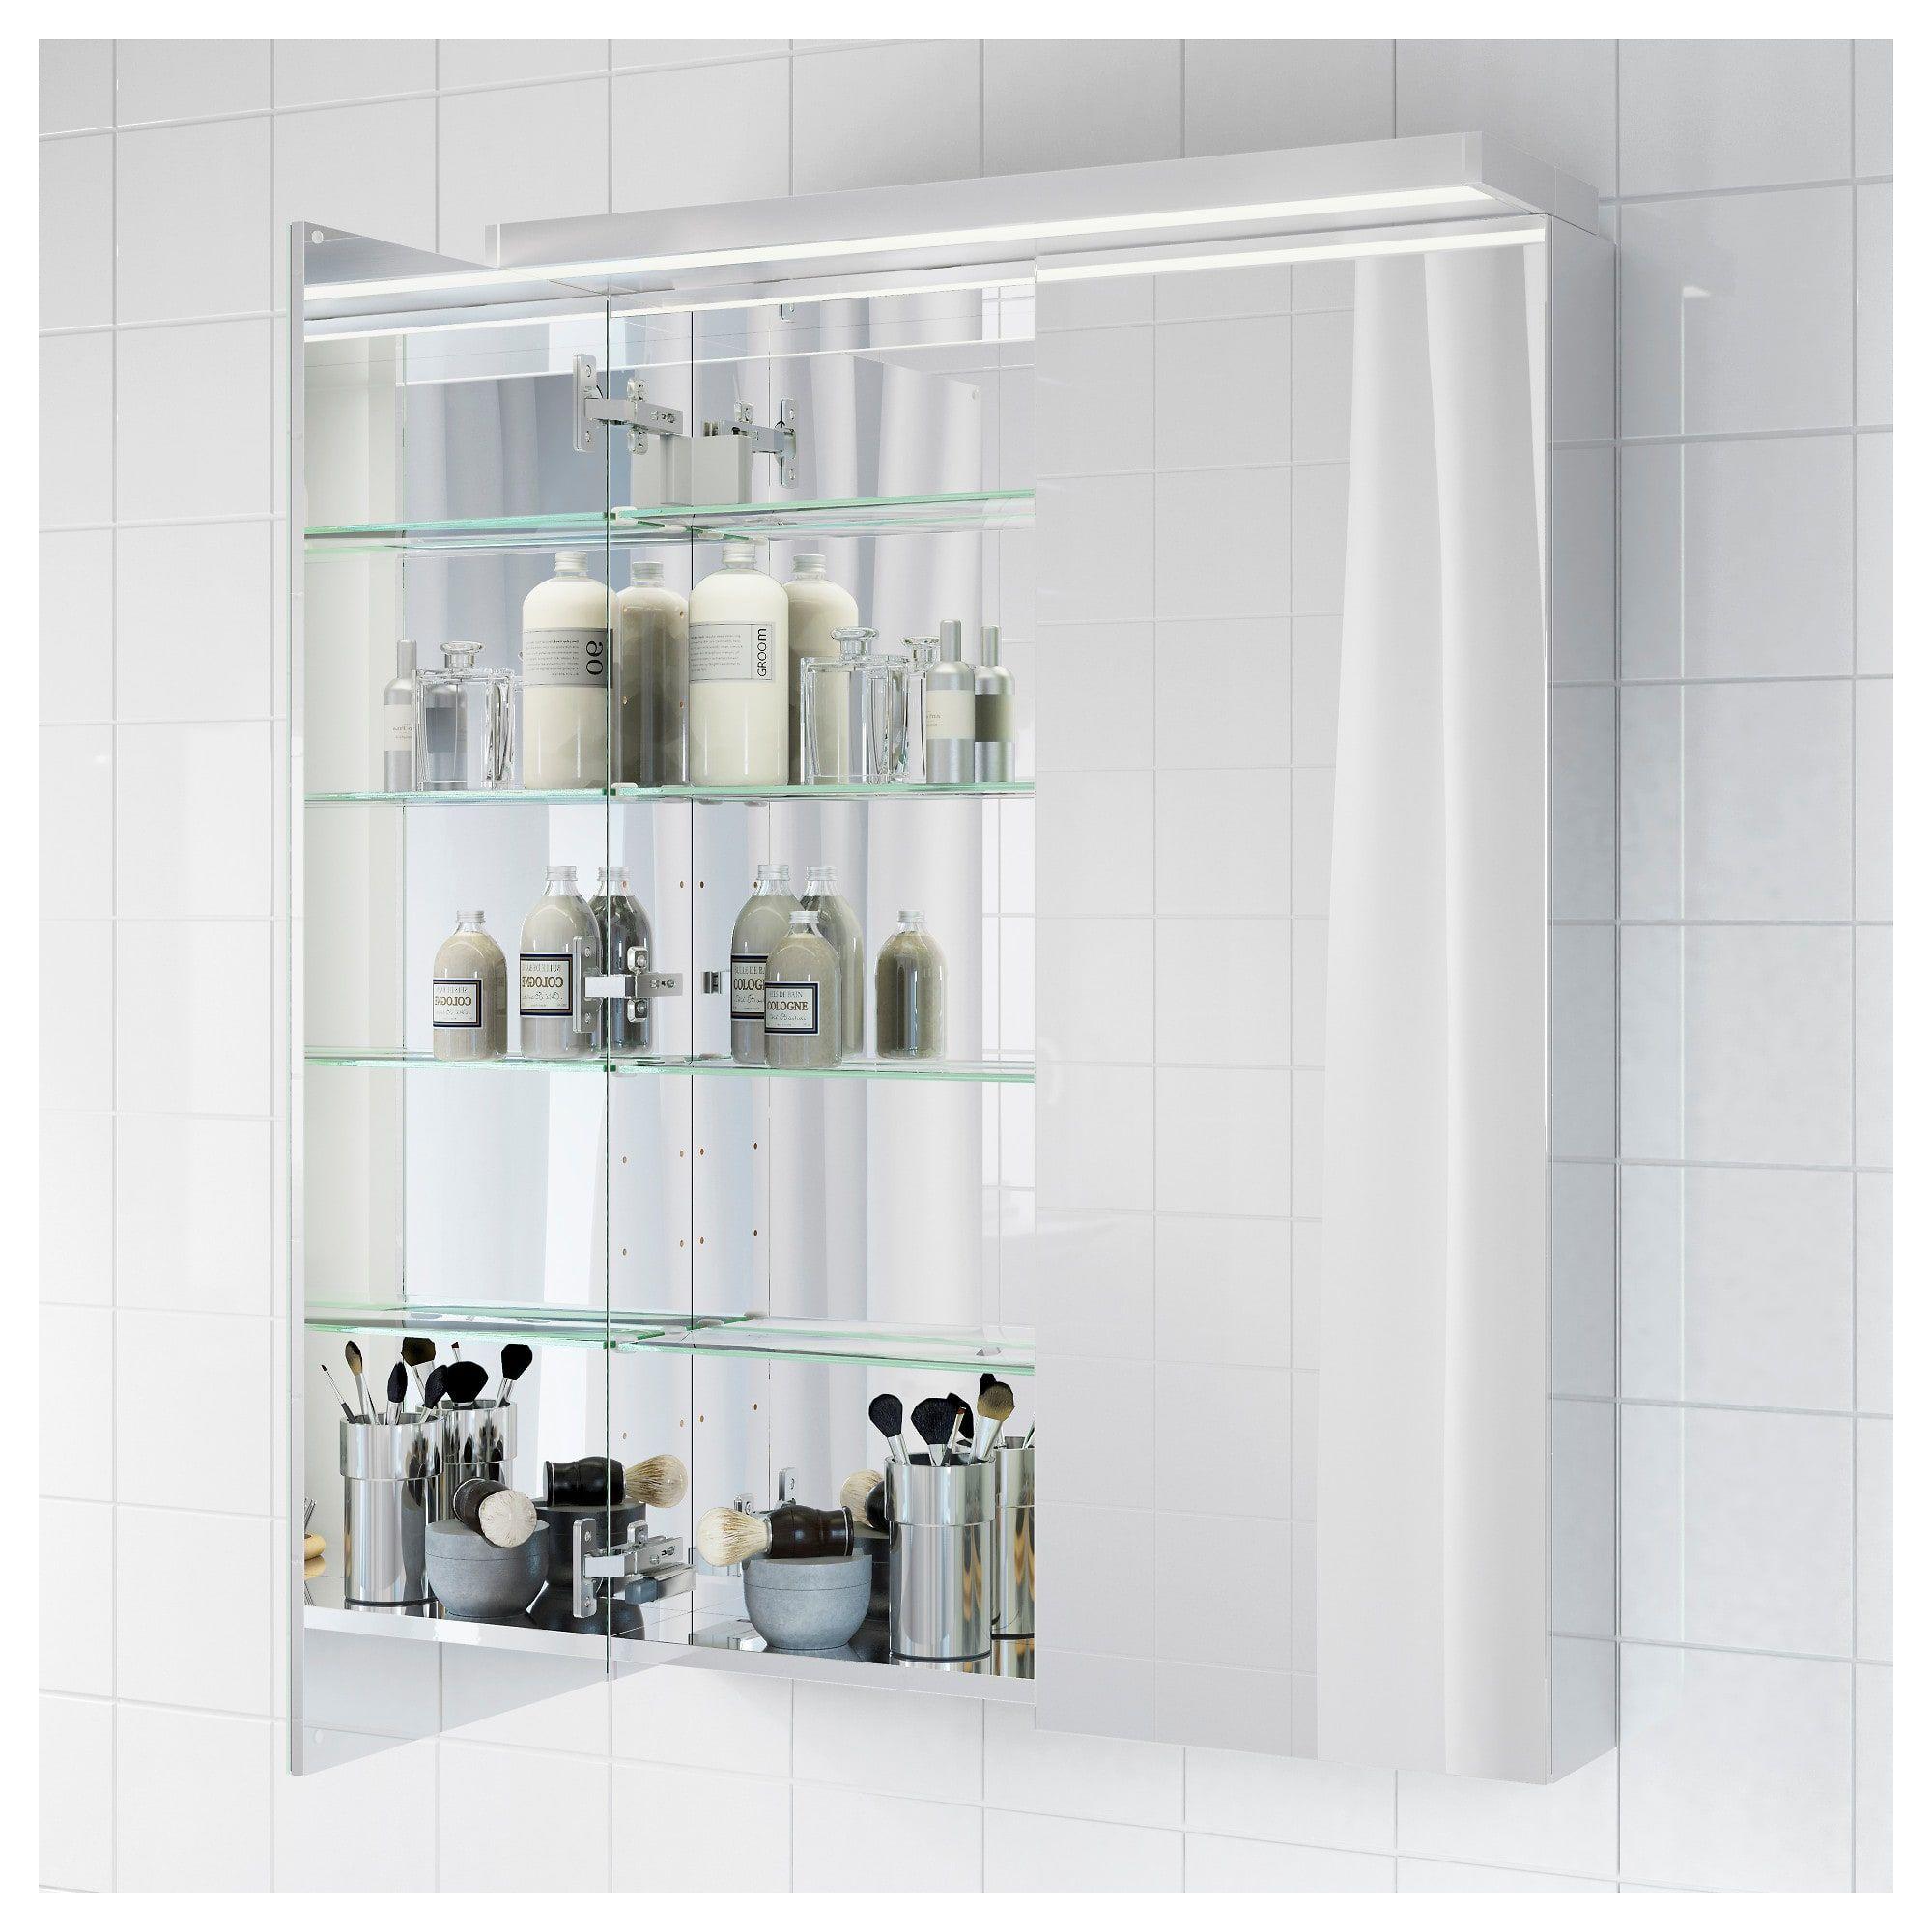 IKEA GODMORGON Mirror cabinet with 2 doors in 2020   Mirror cabinets, Ikea, Amazing bathrooms